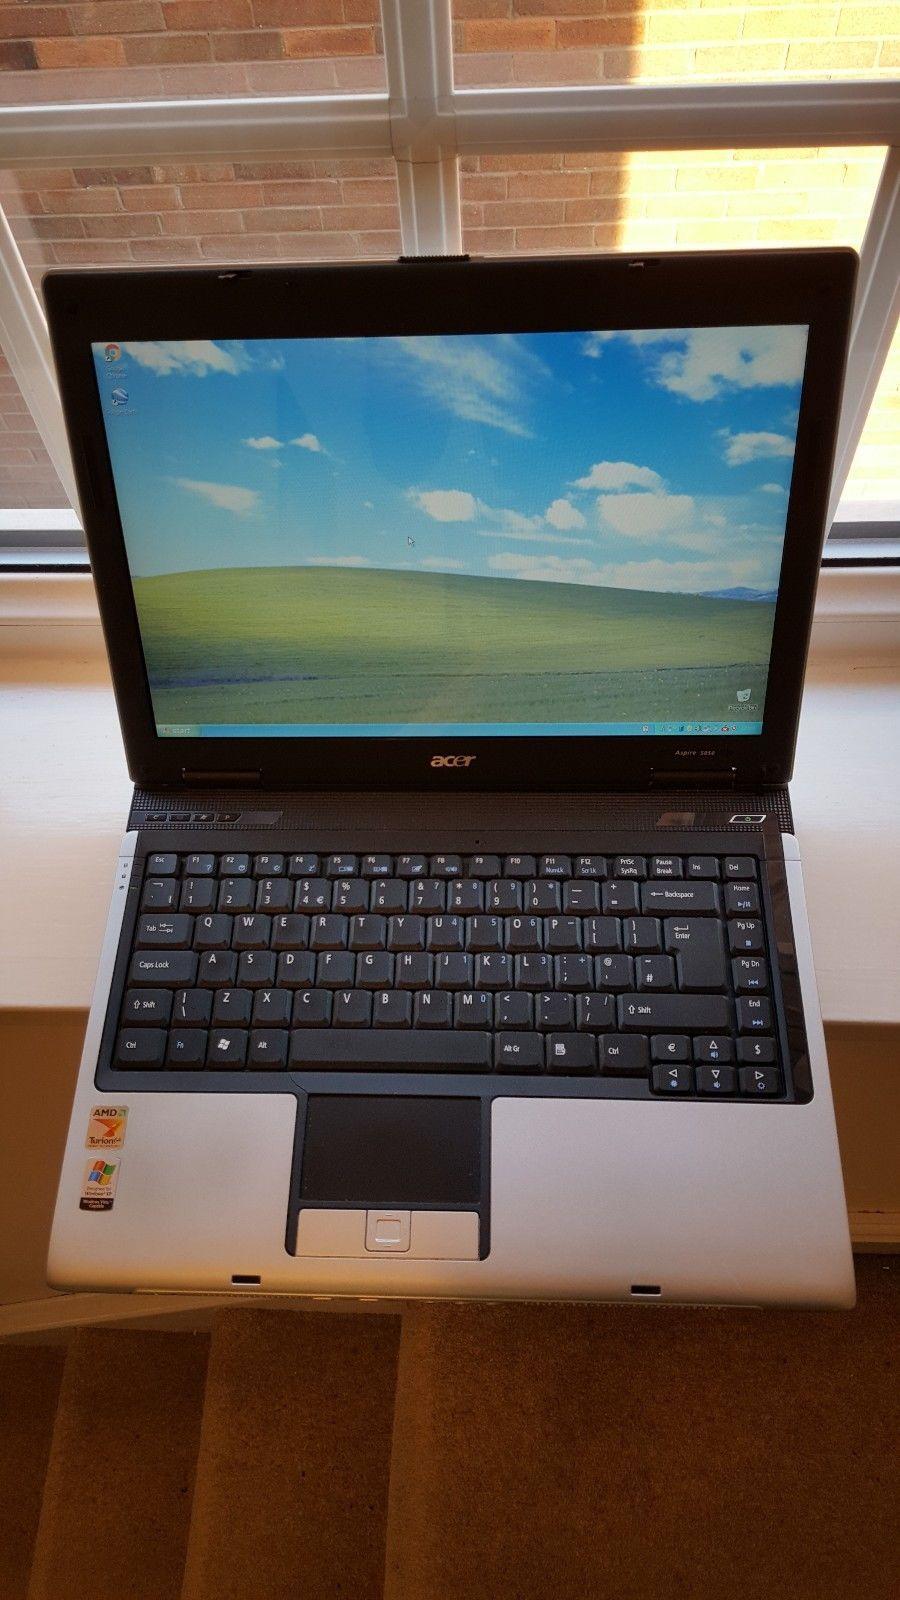 "Acer Aspire 5050 Laptop Notebook 14.1"" 2GHZ 768MB Windows XP AMD Turion 64"